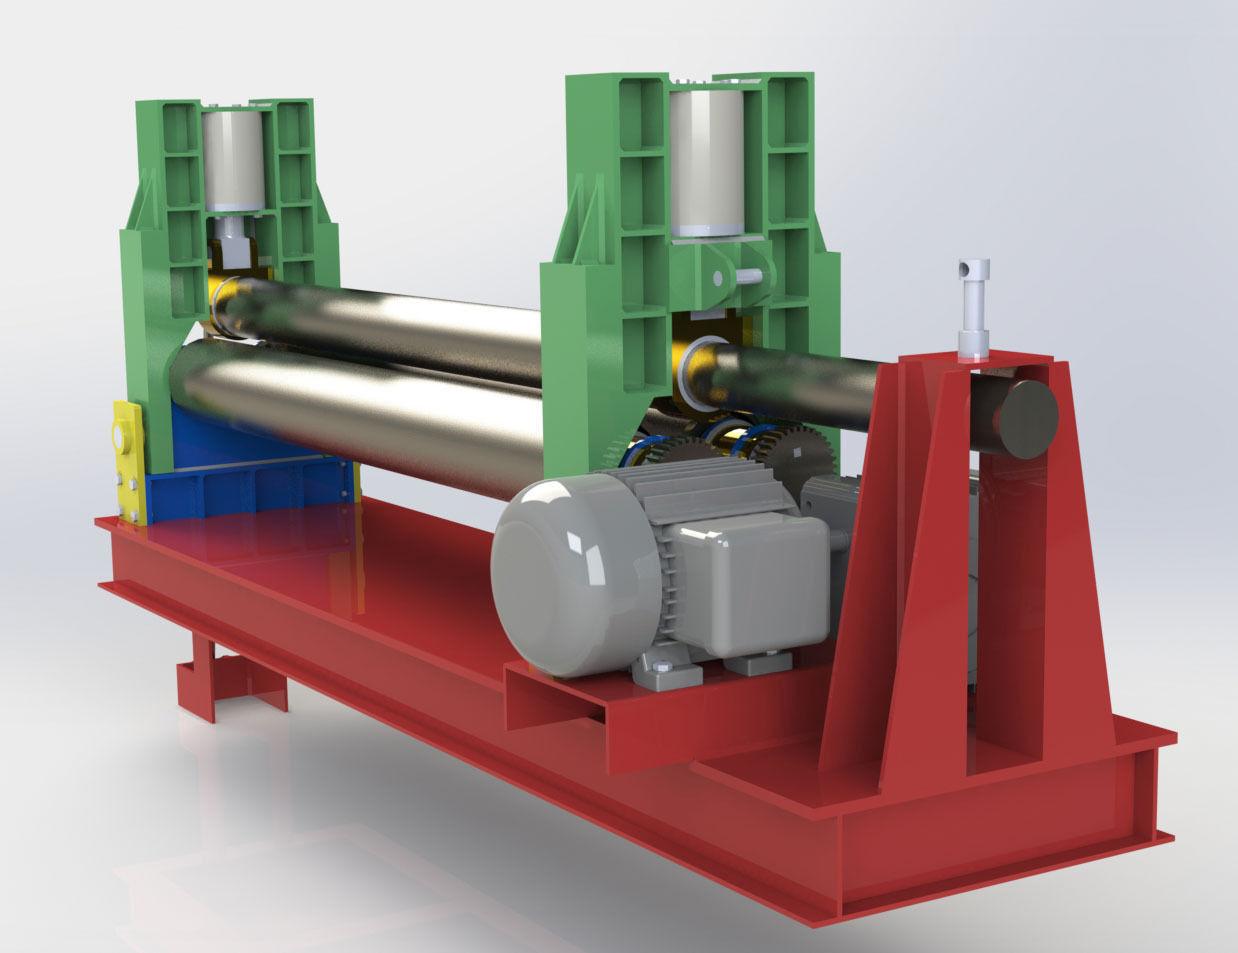 Steel Plate Rolling Machine Free 3d Model Stl Cgtrader Com